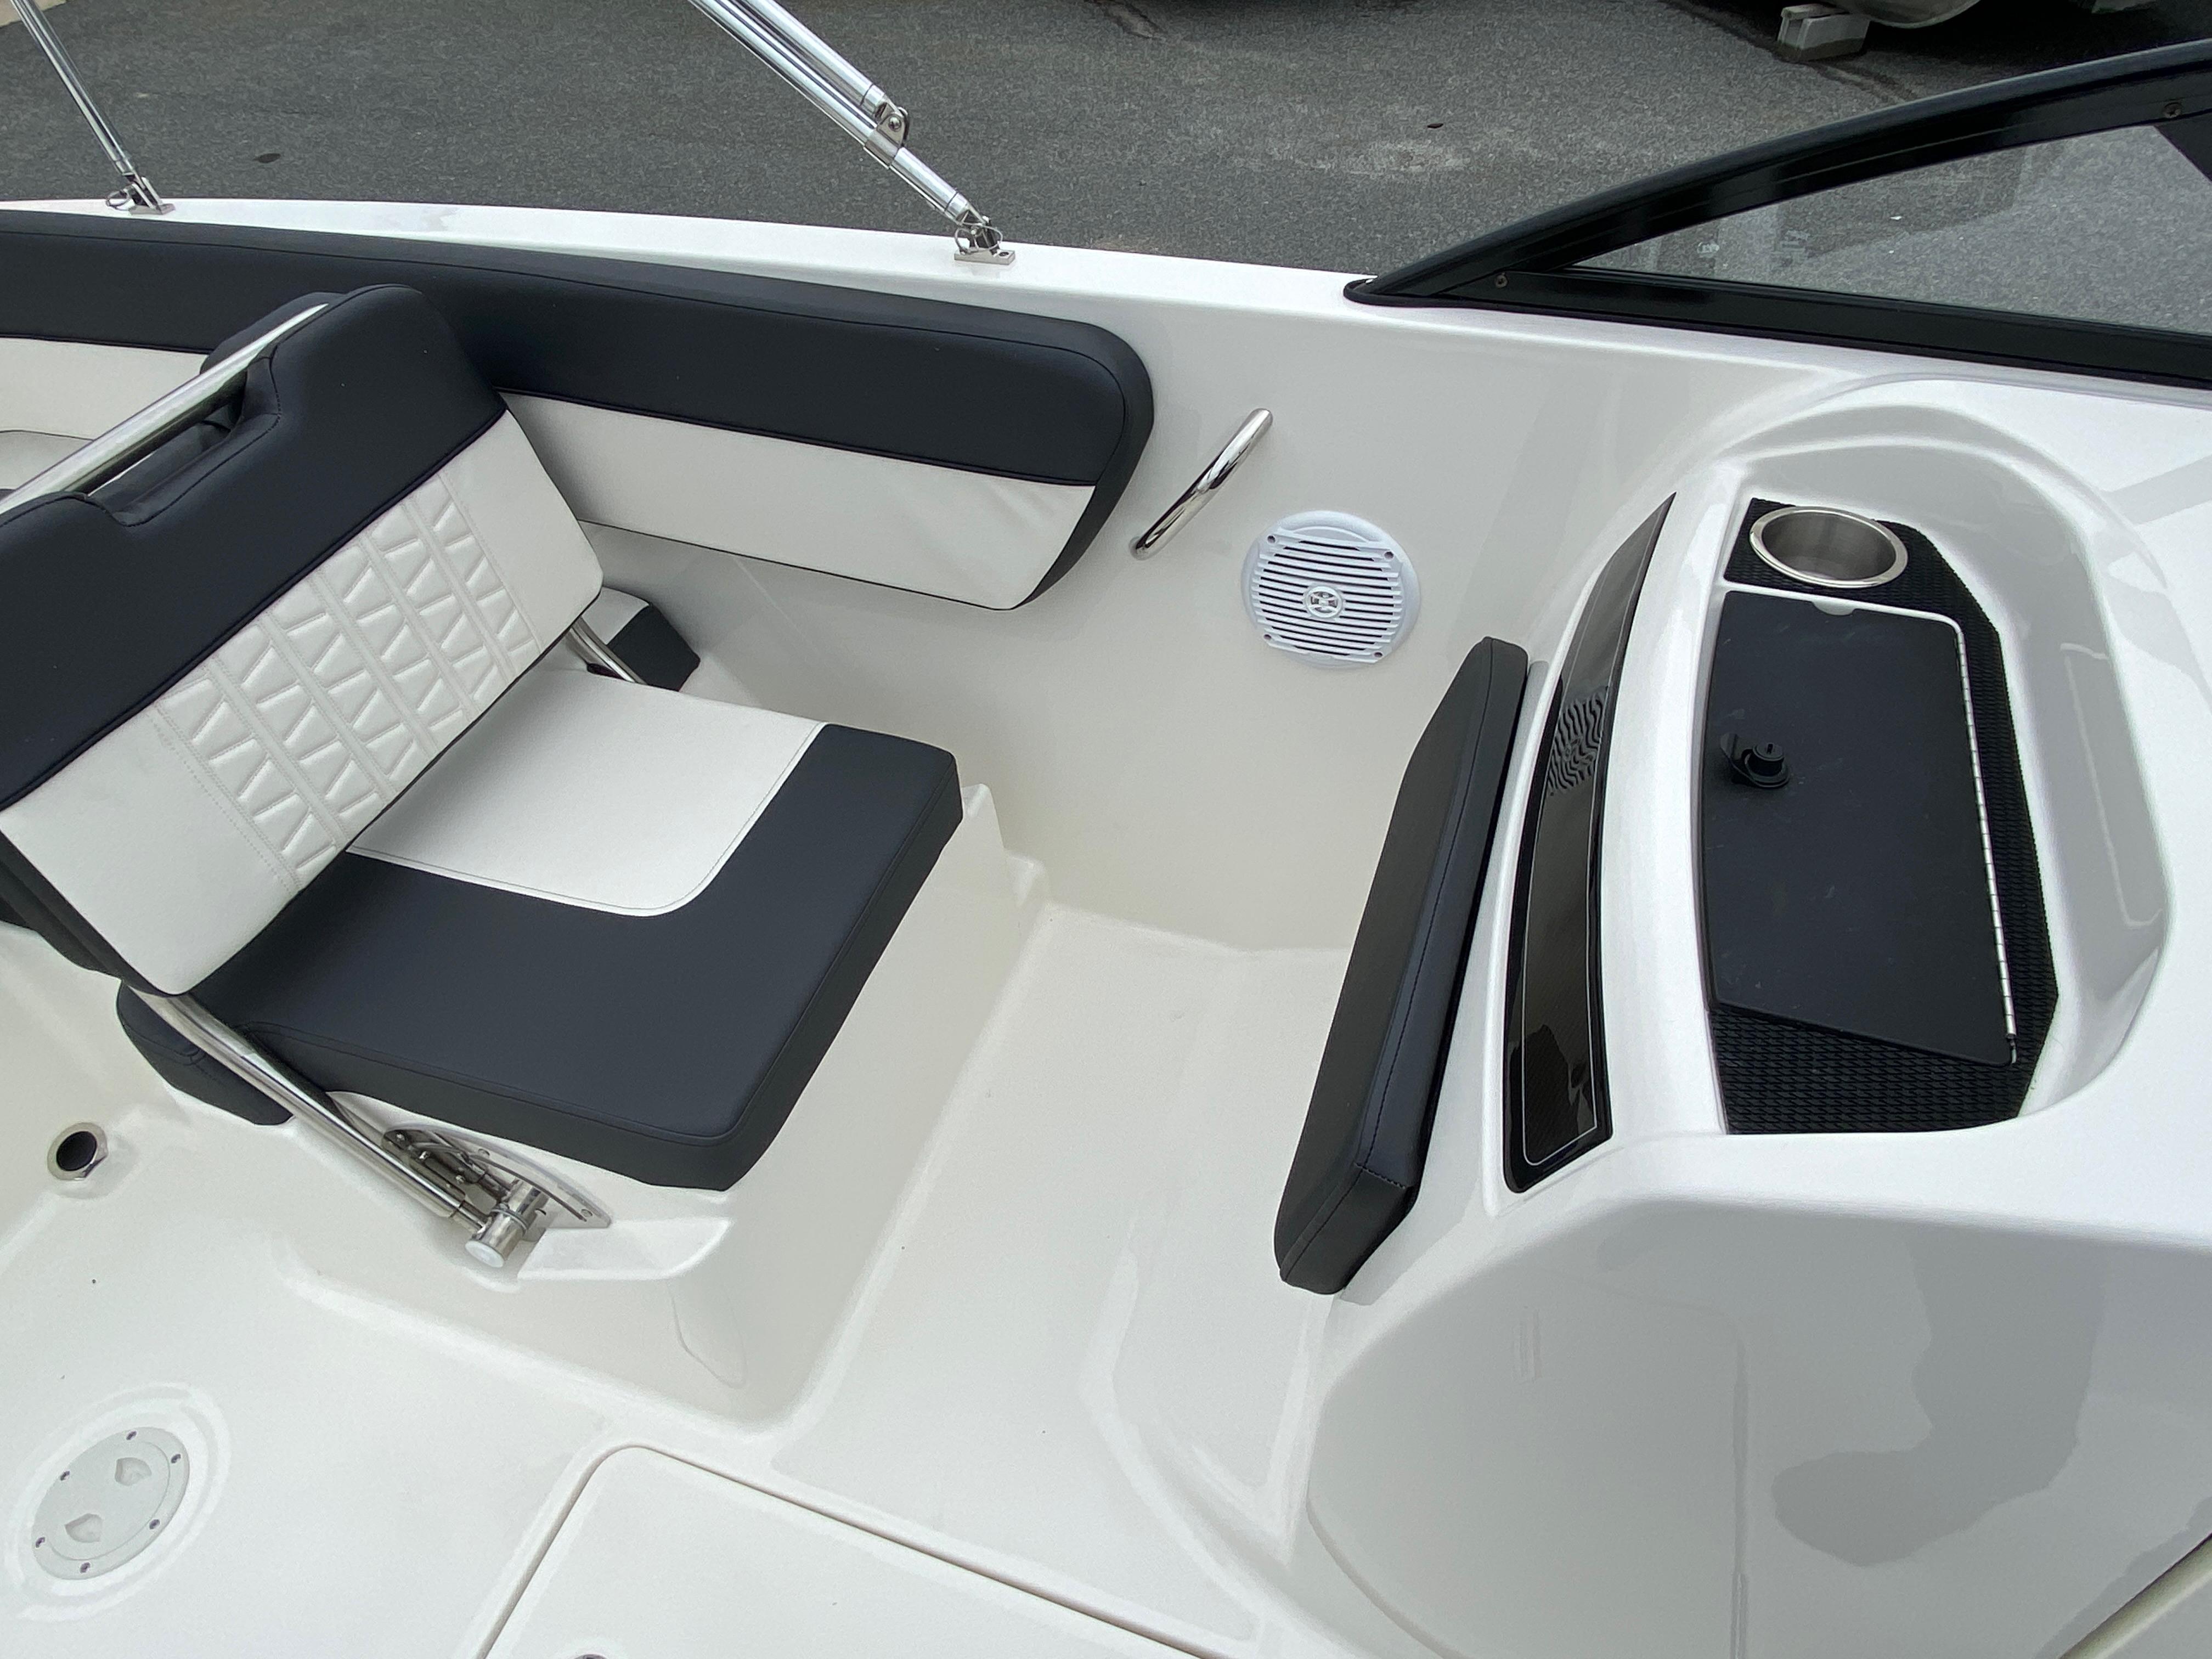 2020 Bayliner boat for sale, model of the boat is VR6 Bowrider & Image # 6 of 14